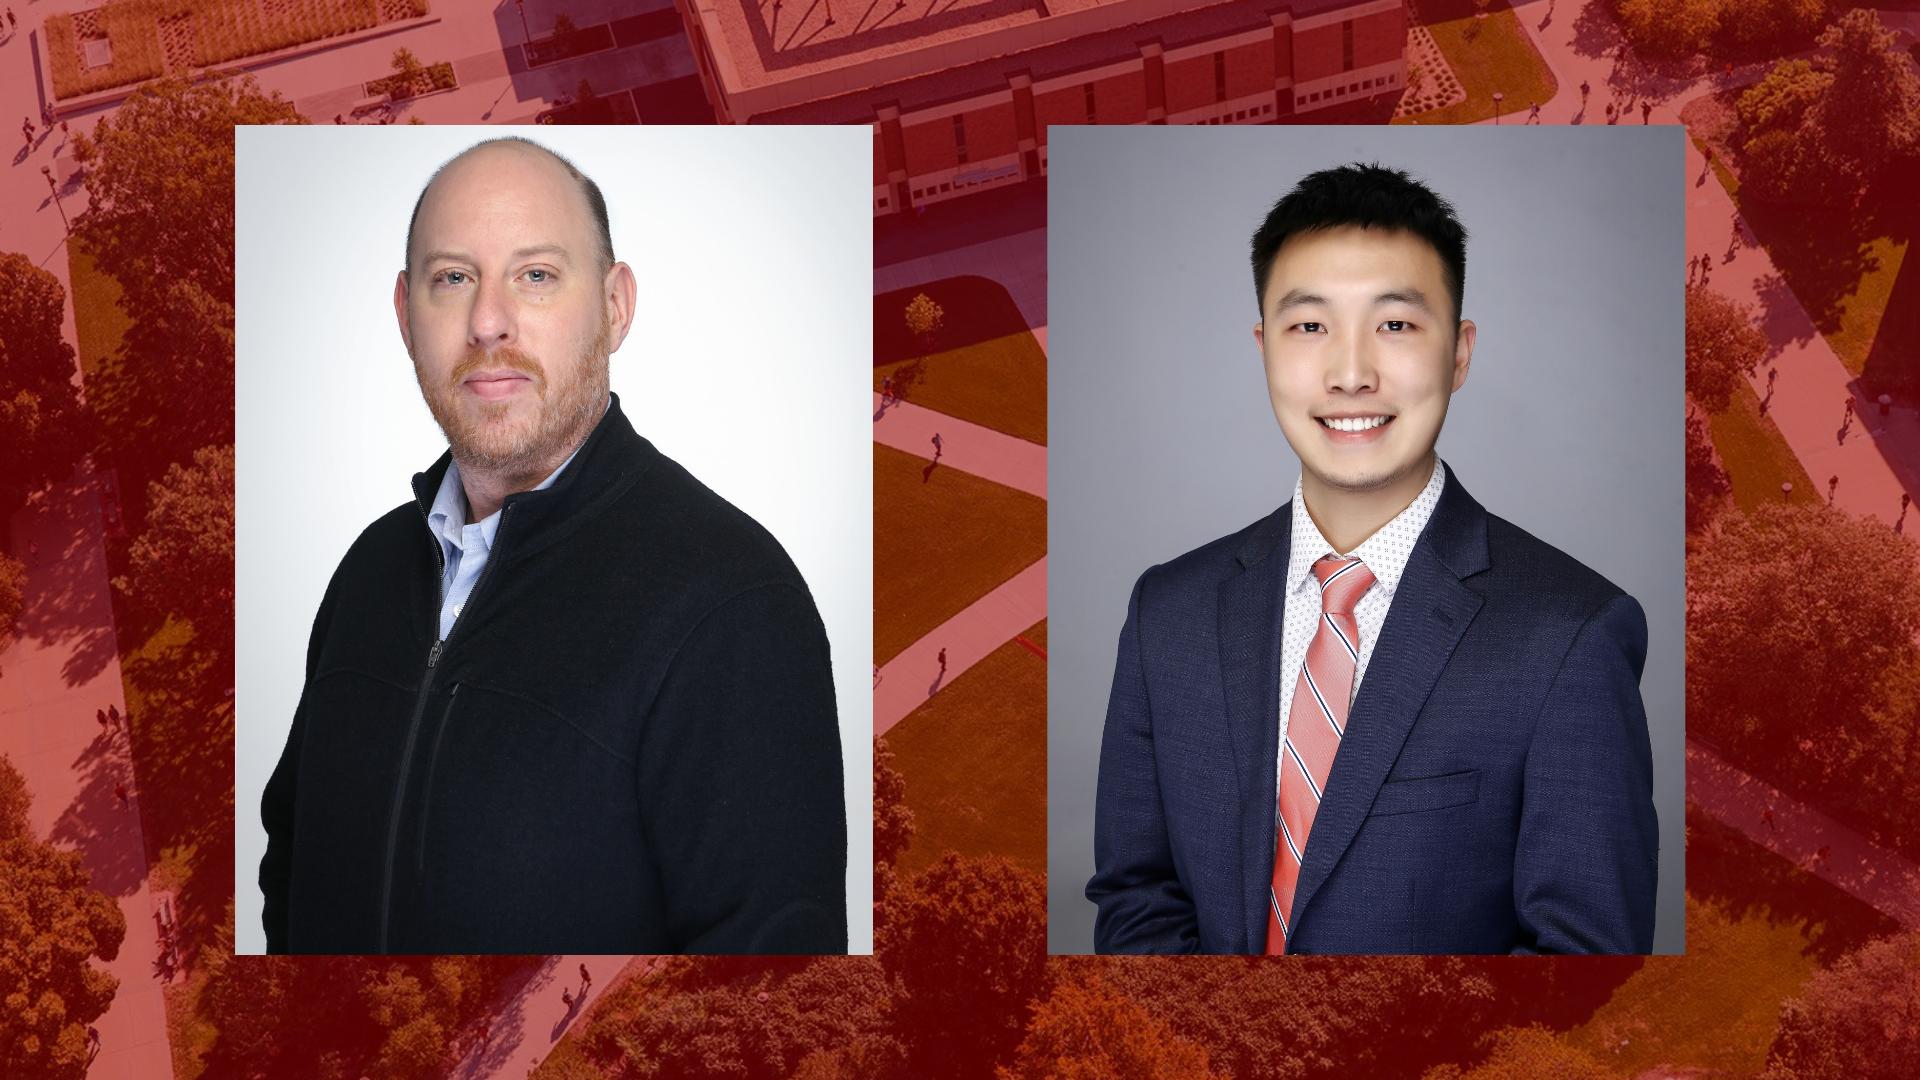 Dan Forman (left) and Chenxiang Zeng (right) are the new team members at the UNL-Zhejiang University Partnership Degree Program in Hangzhou, China.